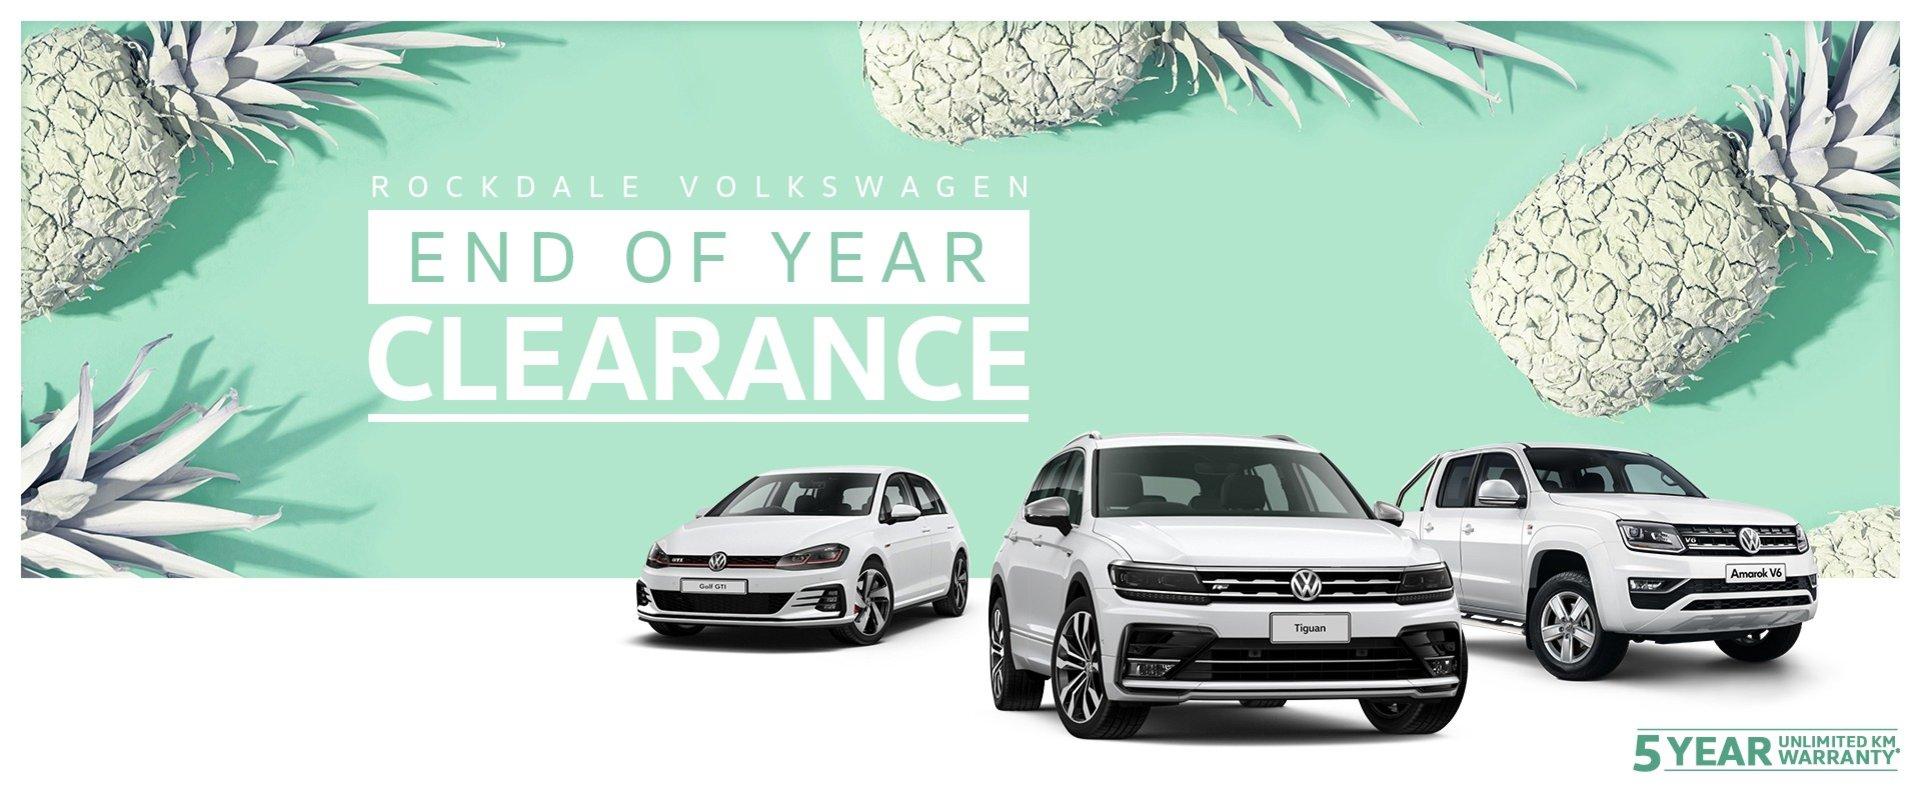 Rockdale Volkswagen End Of Year Clearance Sale